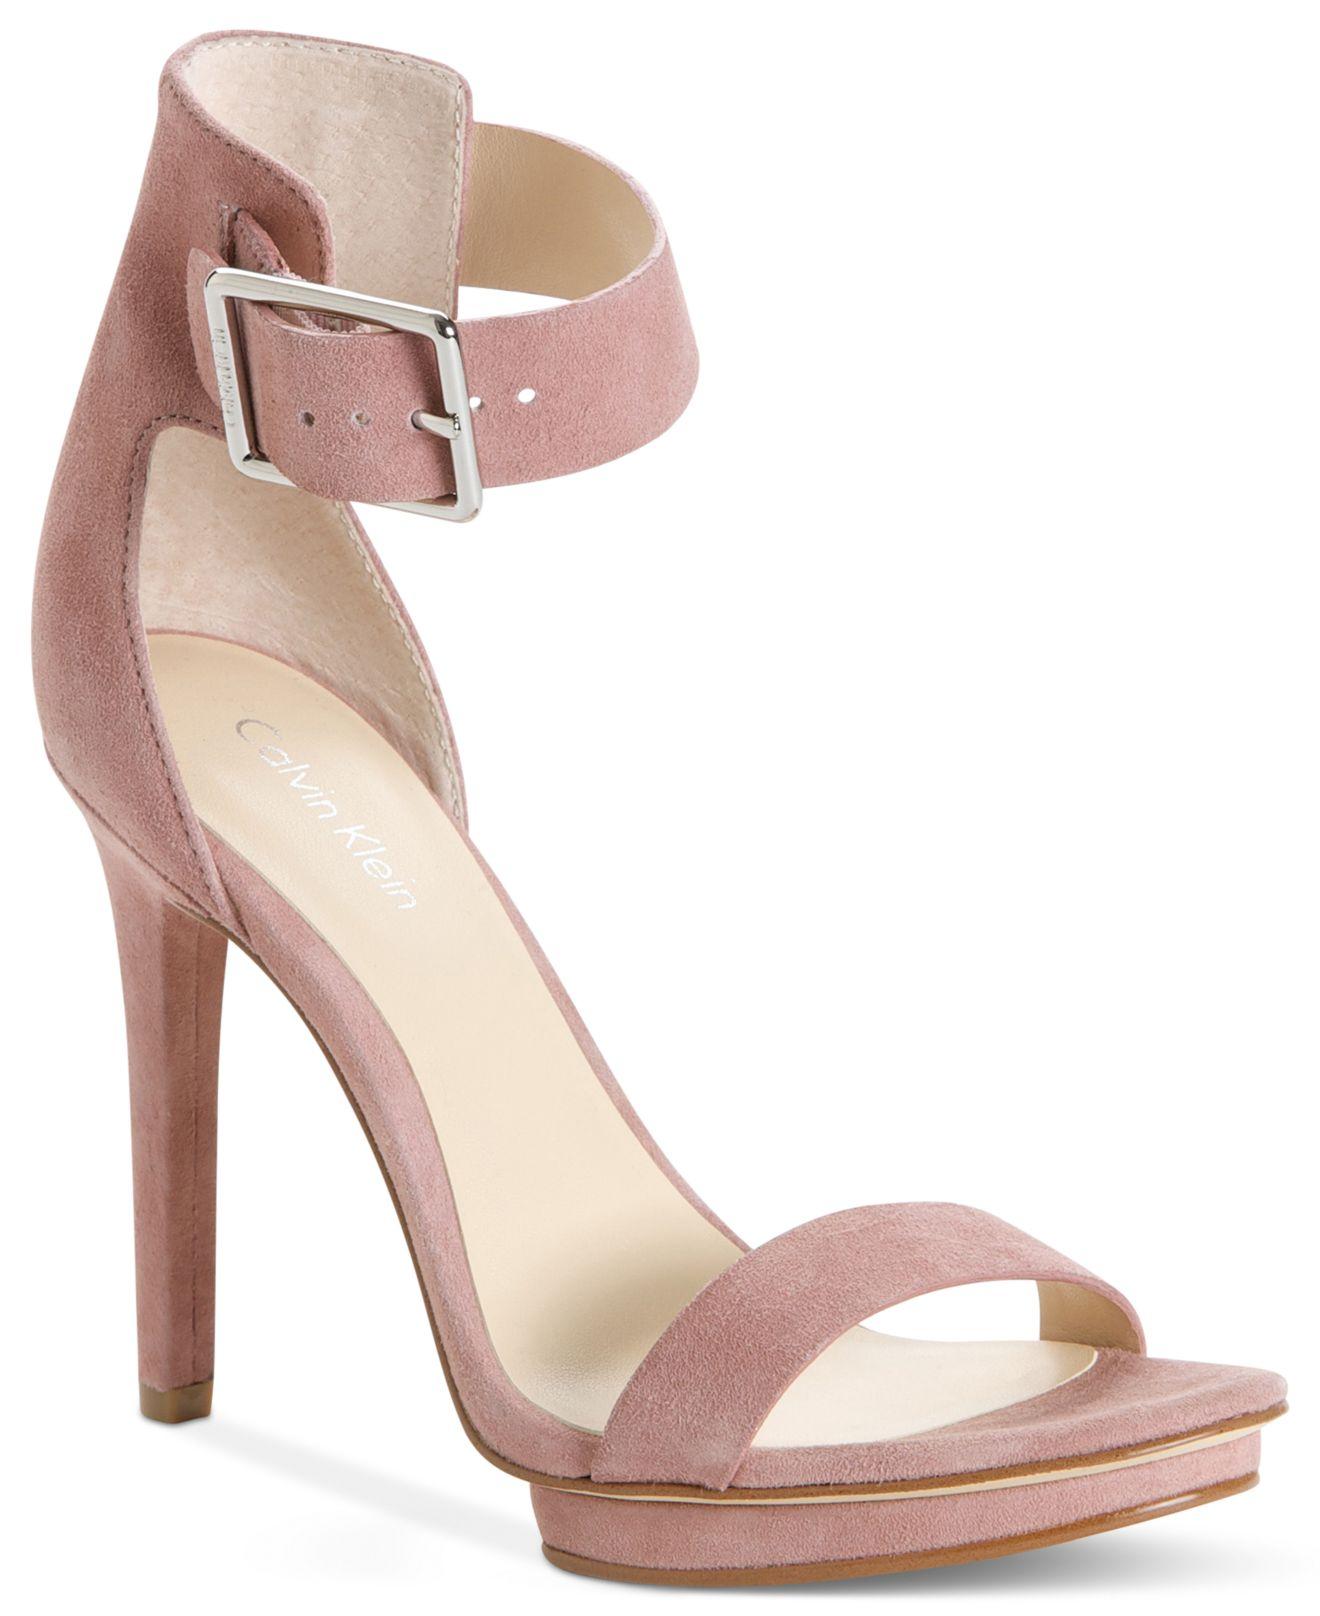 3591af89d98d Lyst - Calvin Klein Women S Vivian High Heel Sandals in Blue